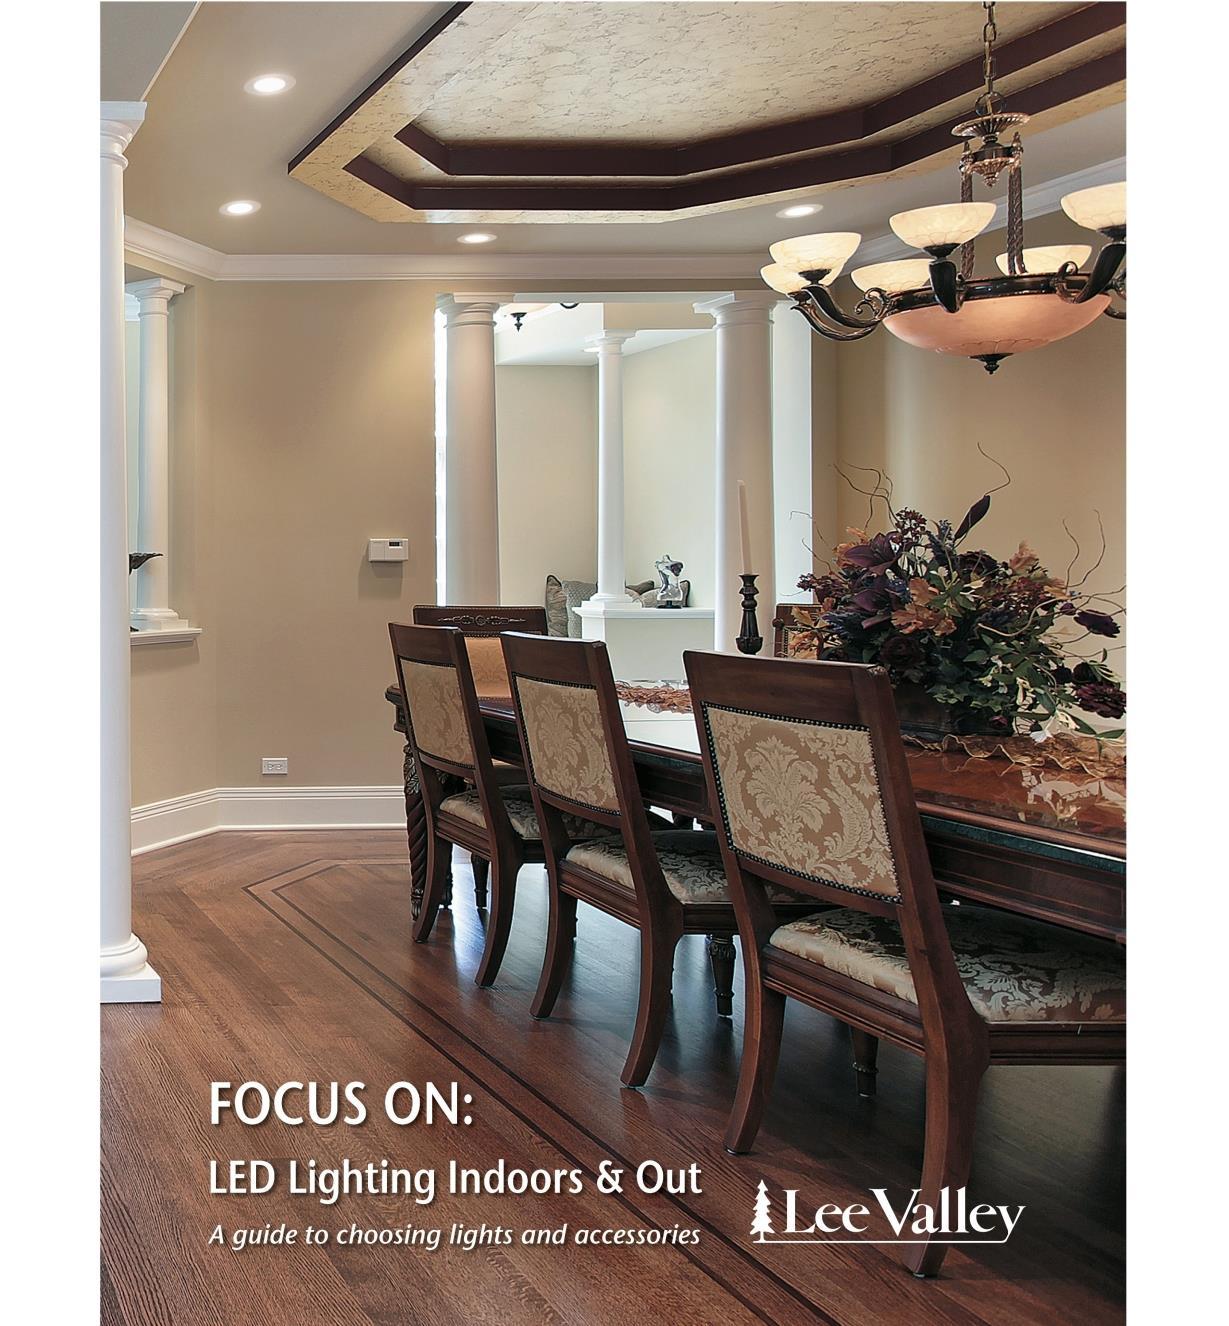 U0119LED - Focus On: LED Lighting Indoors & Out